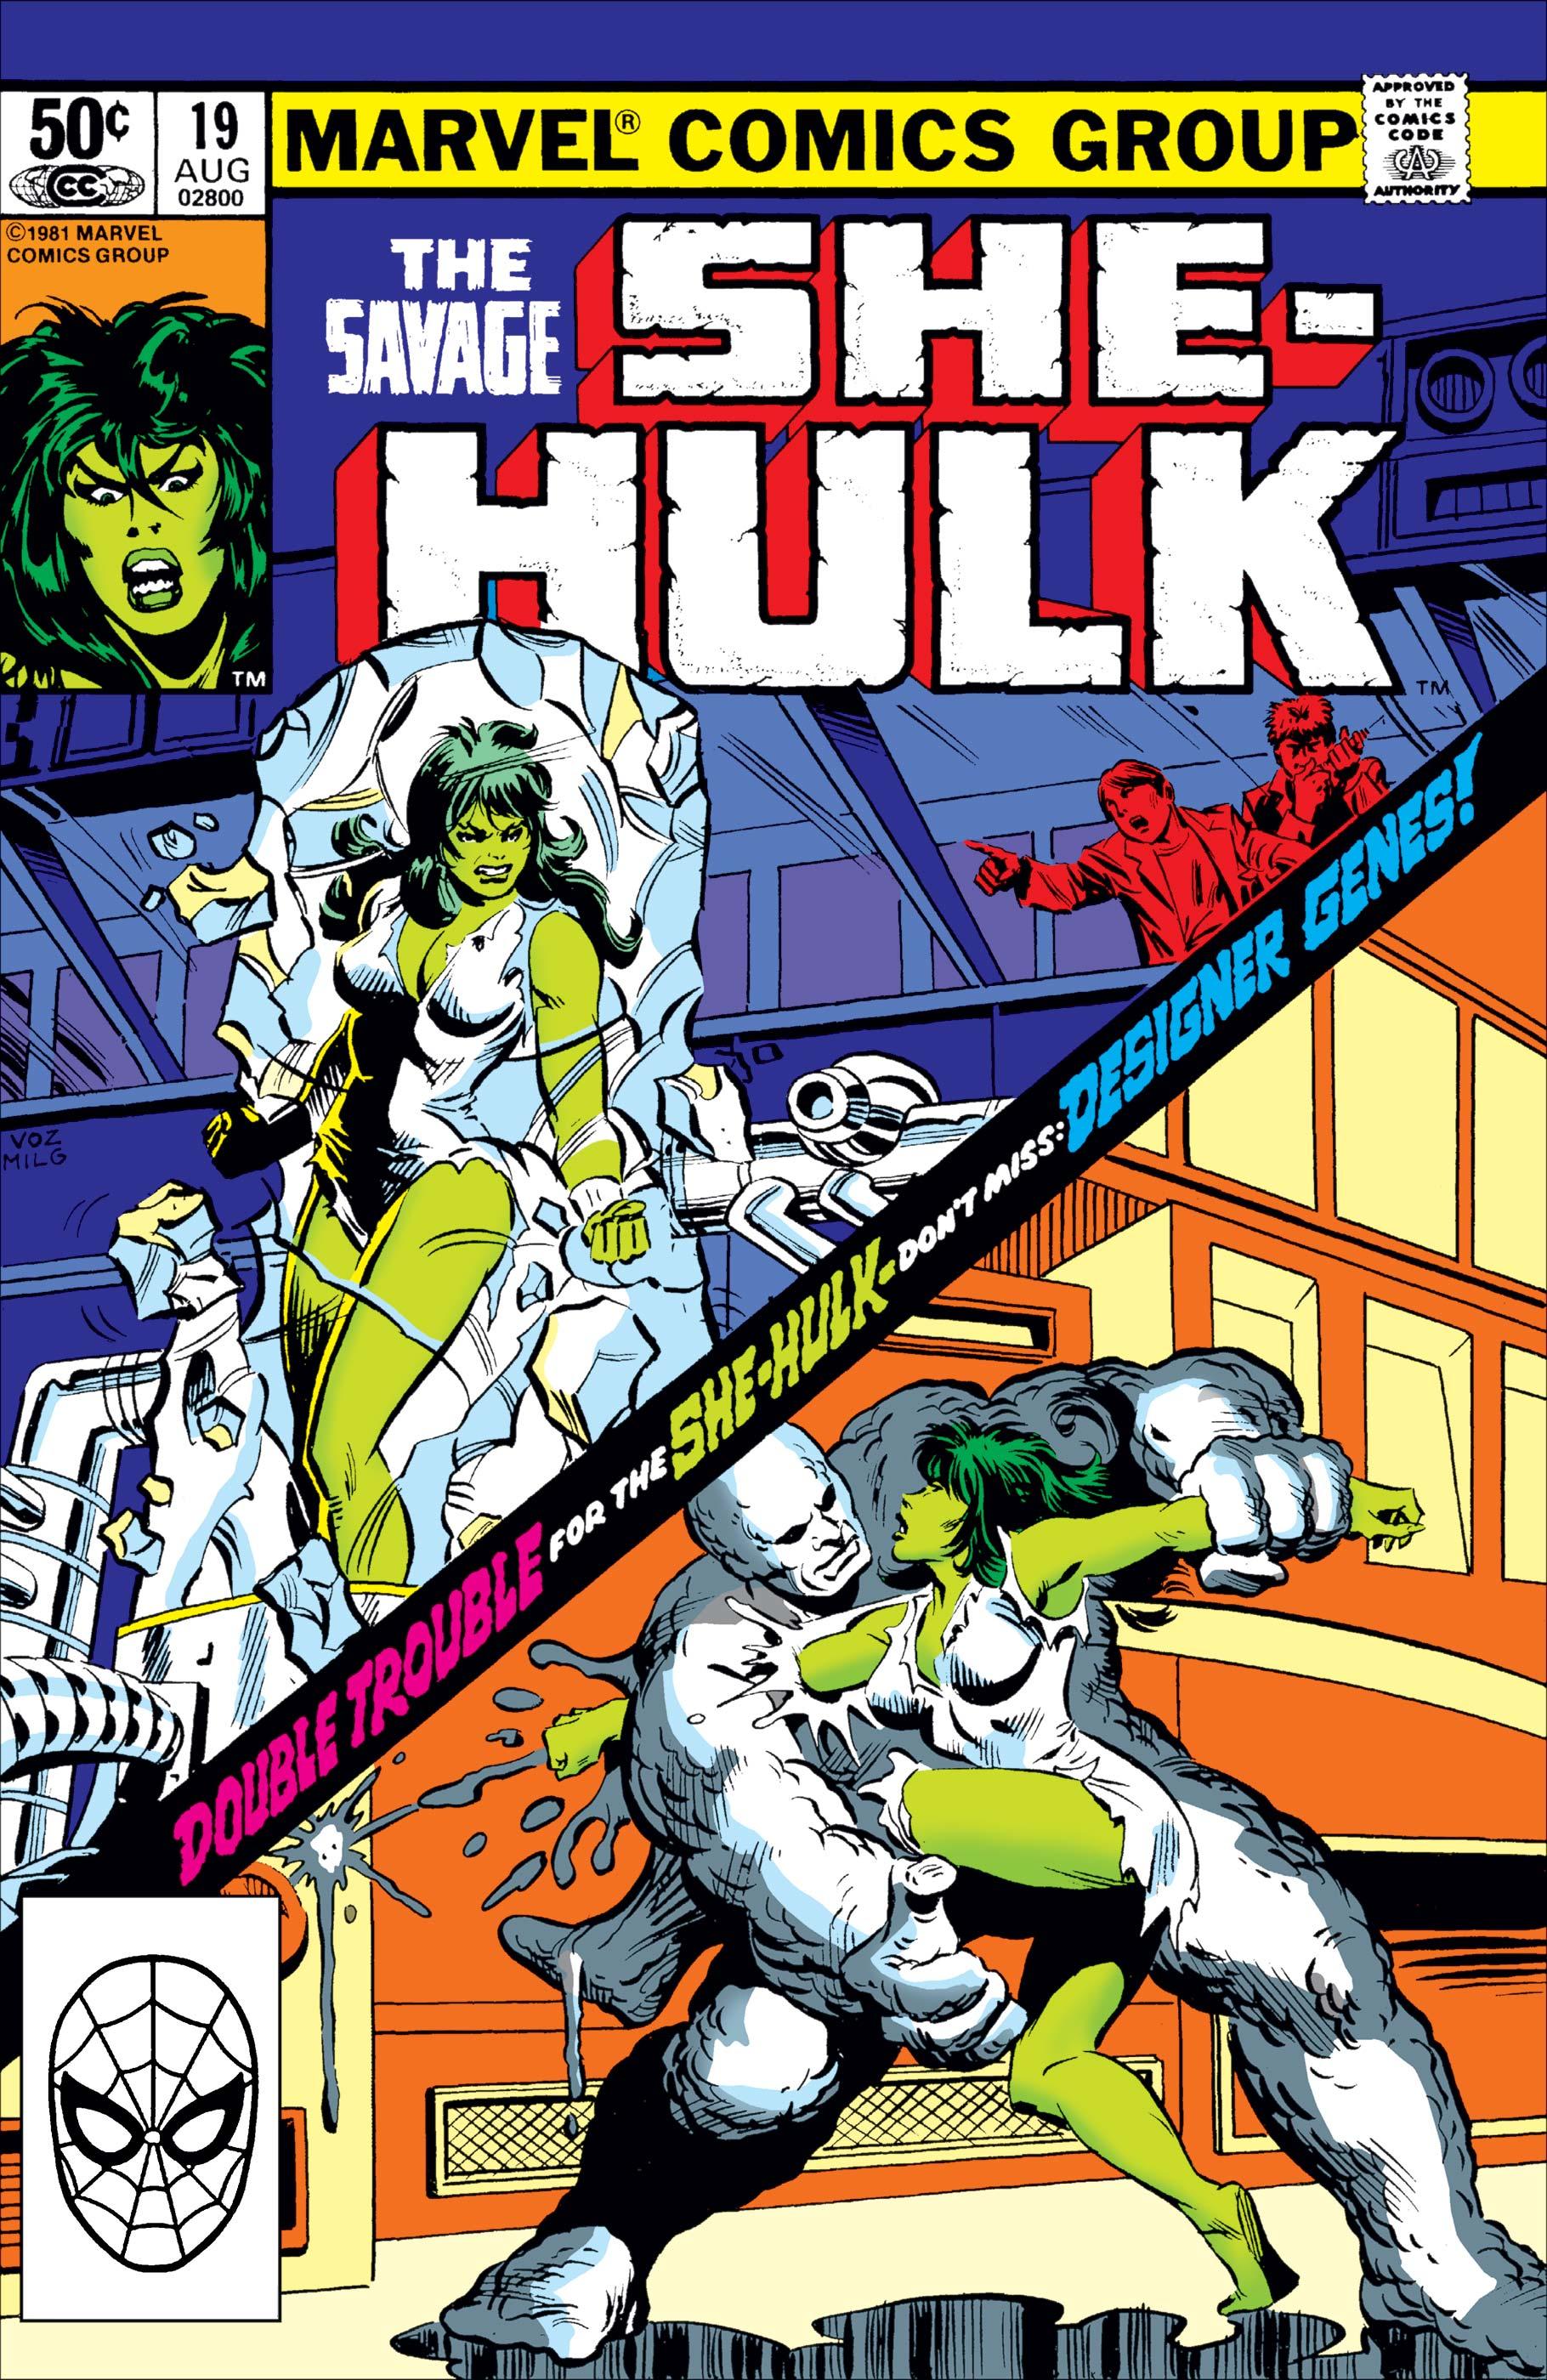 Savage She-Hulk (1980) #19